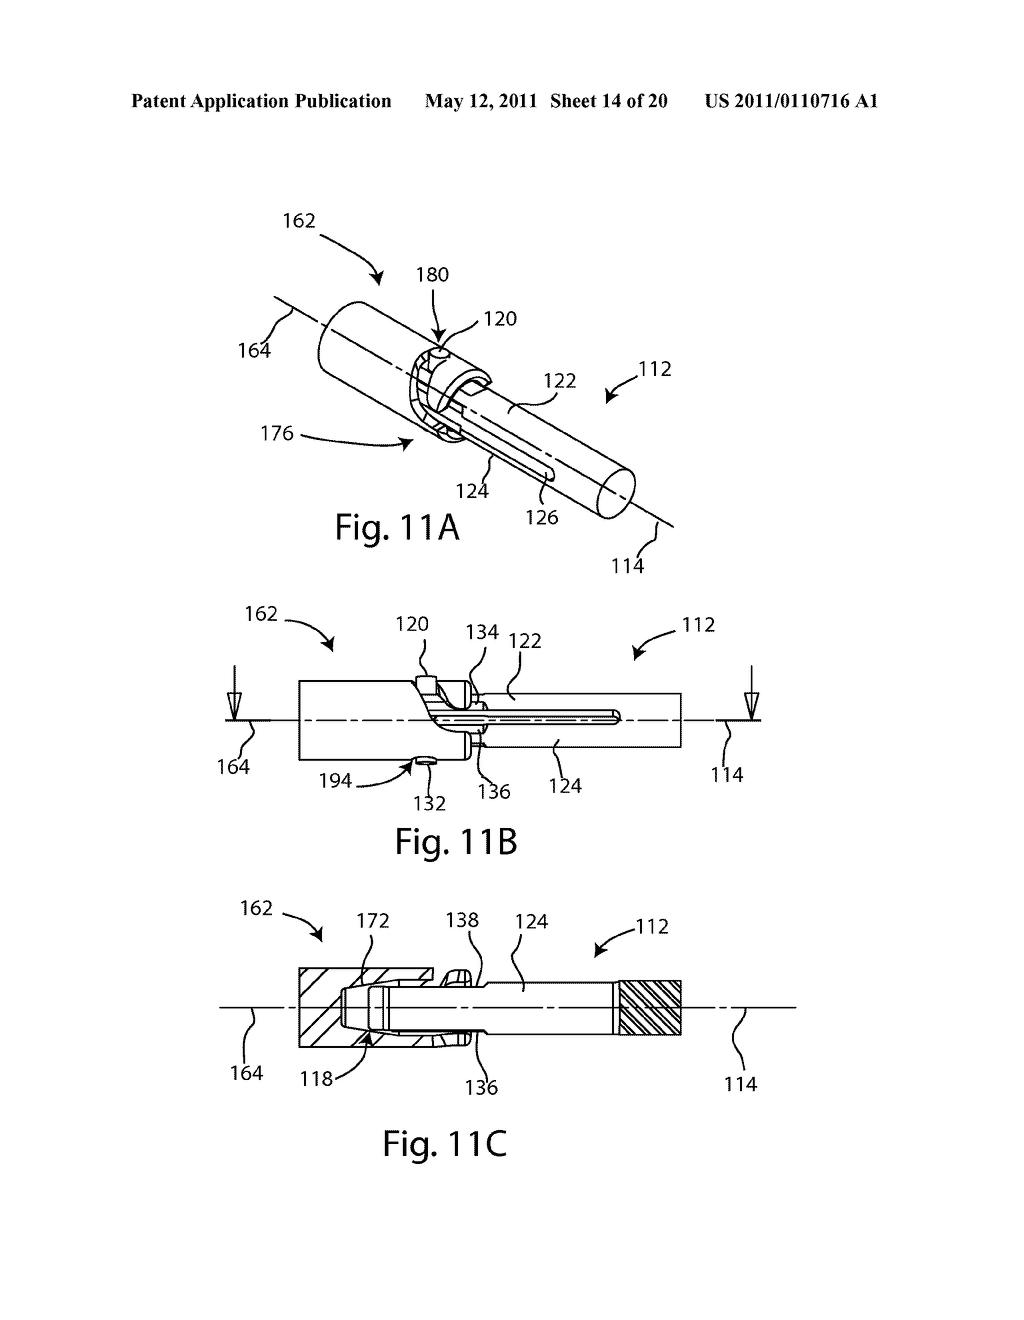 Quarter Turn Locking Mechanism Diagram Schematic And Image 15 Grade 9 Circuit Worksheet